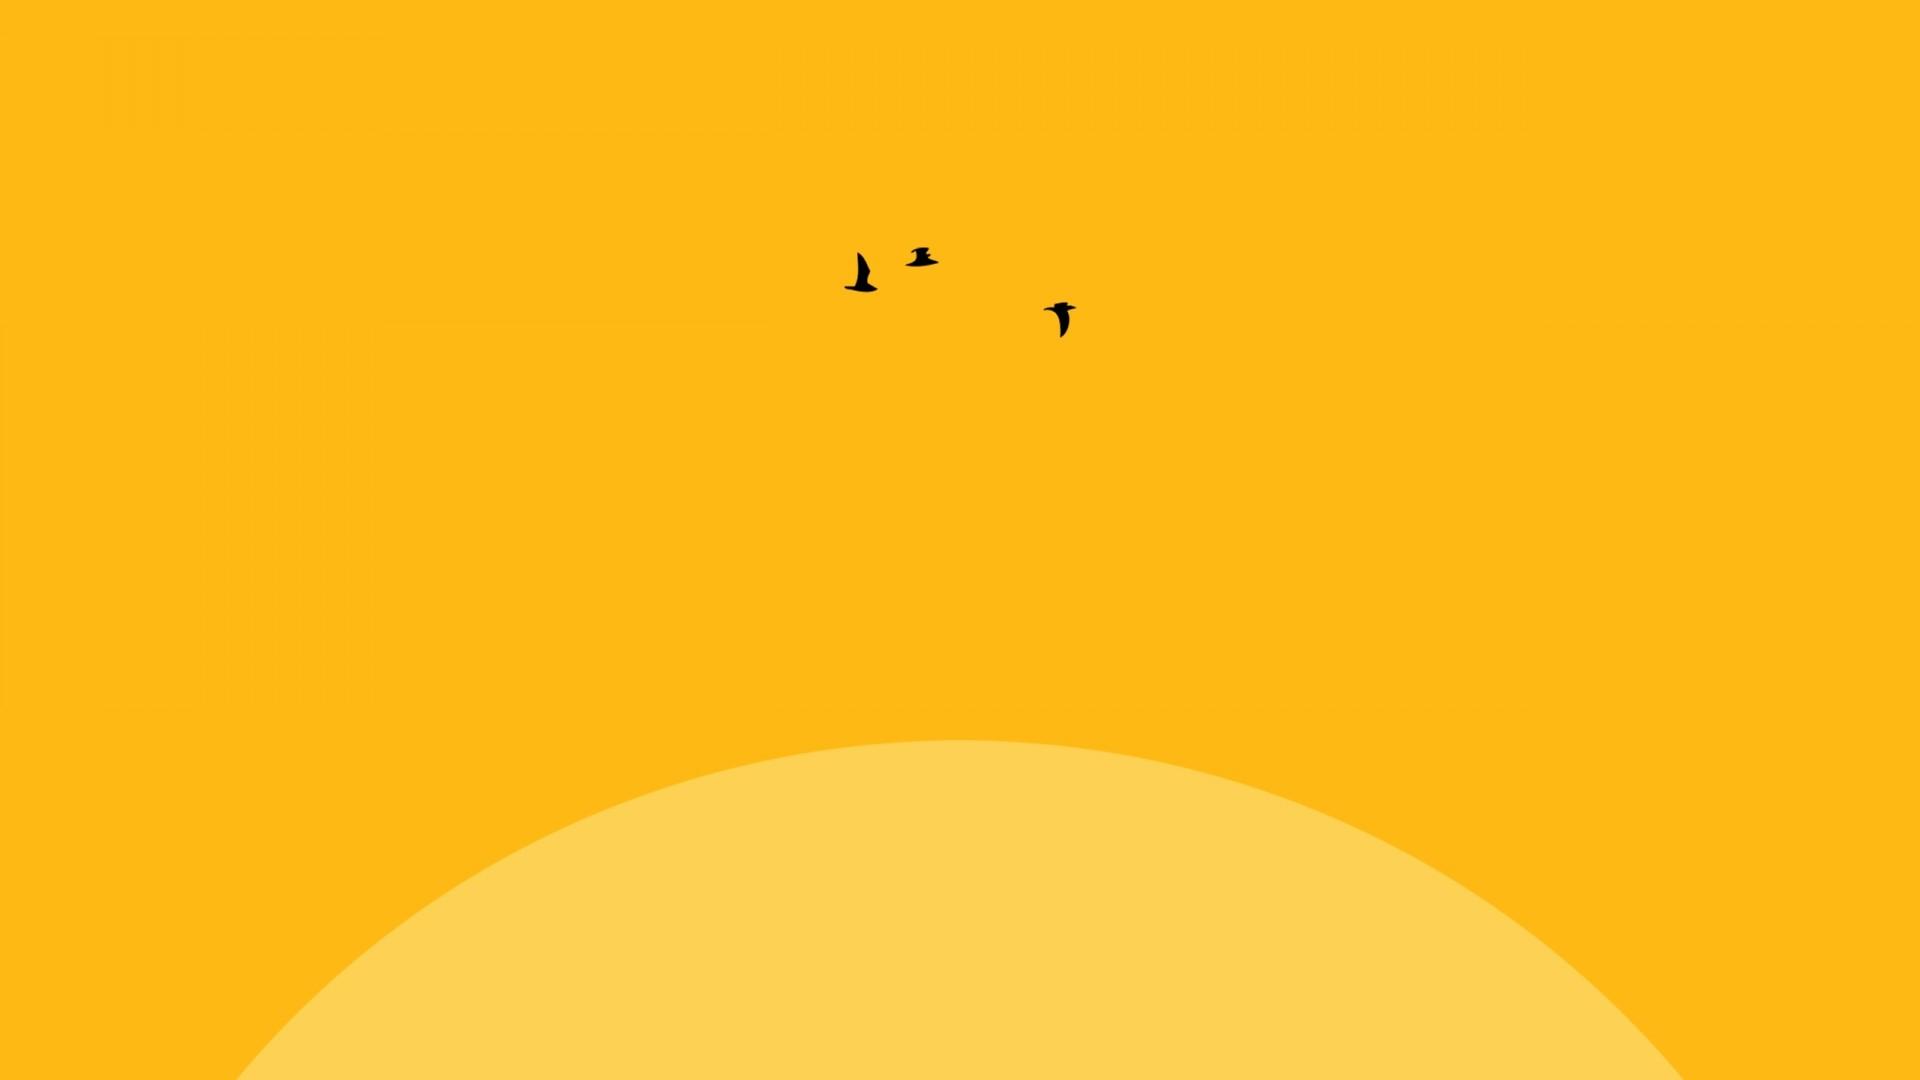 Cute Yellow HD Wallpaper